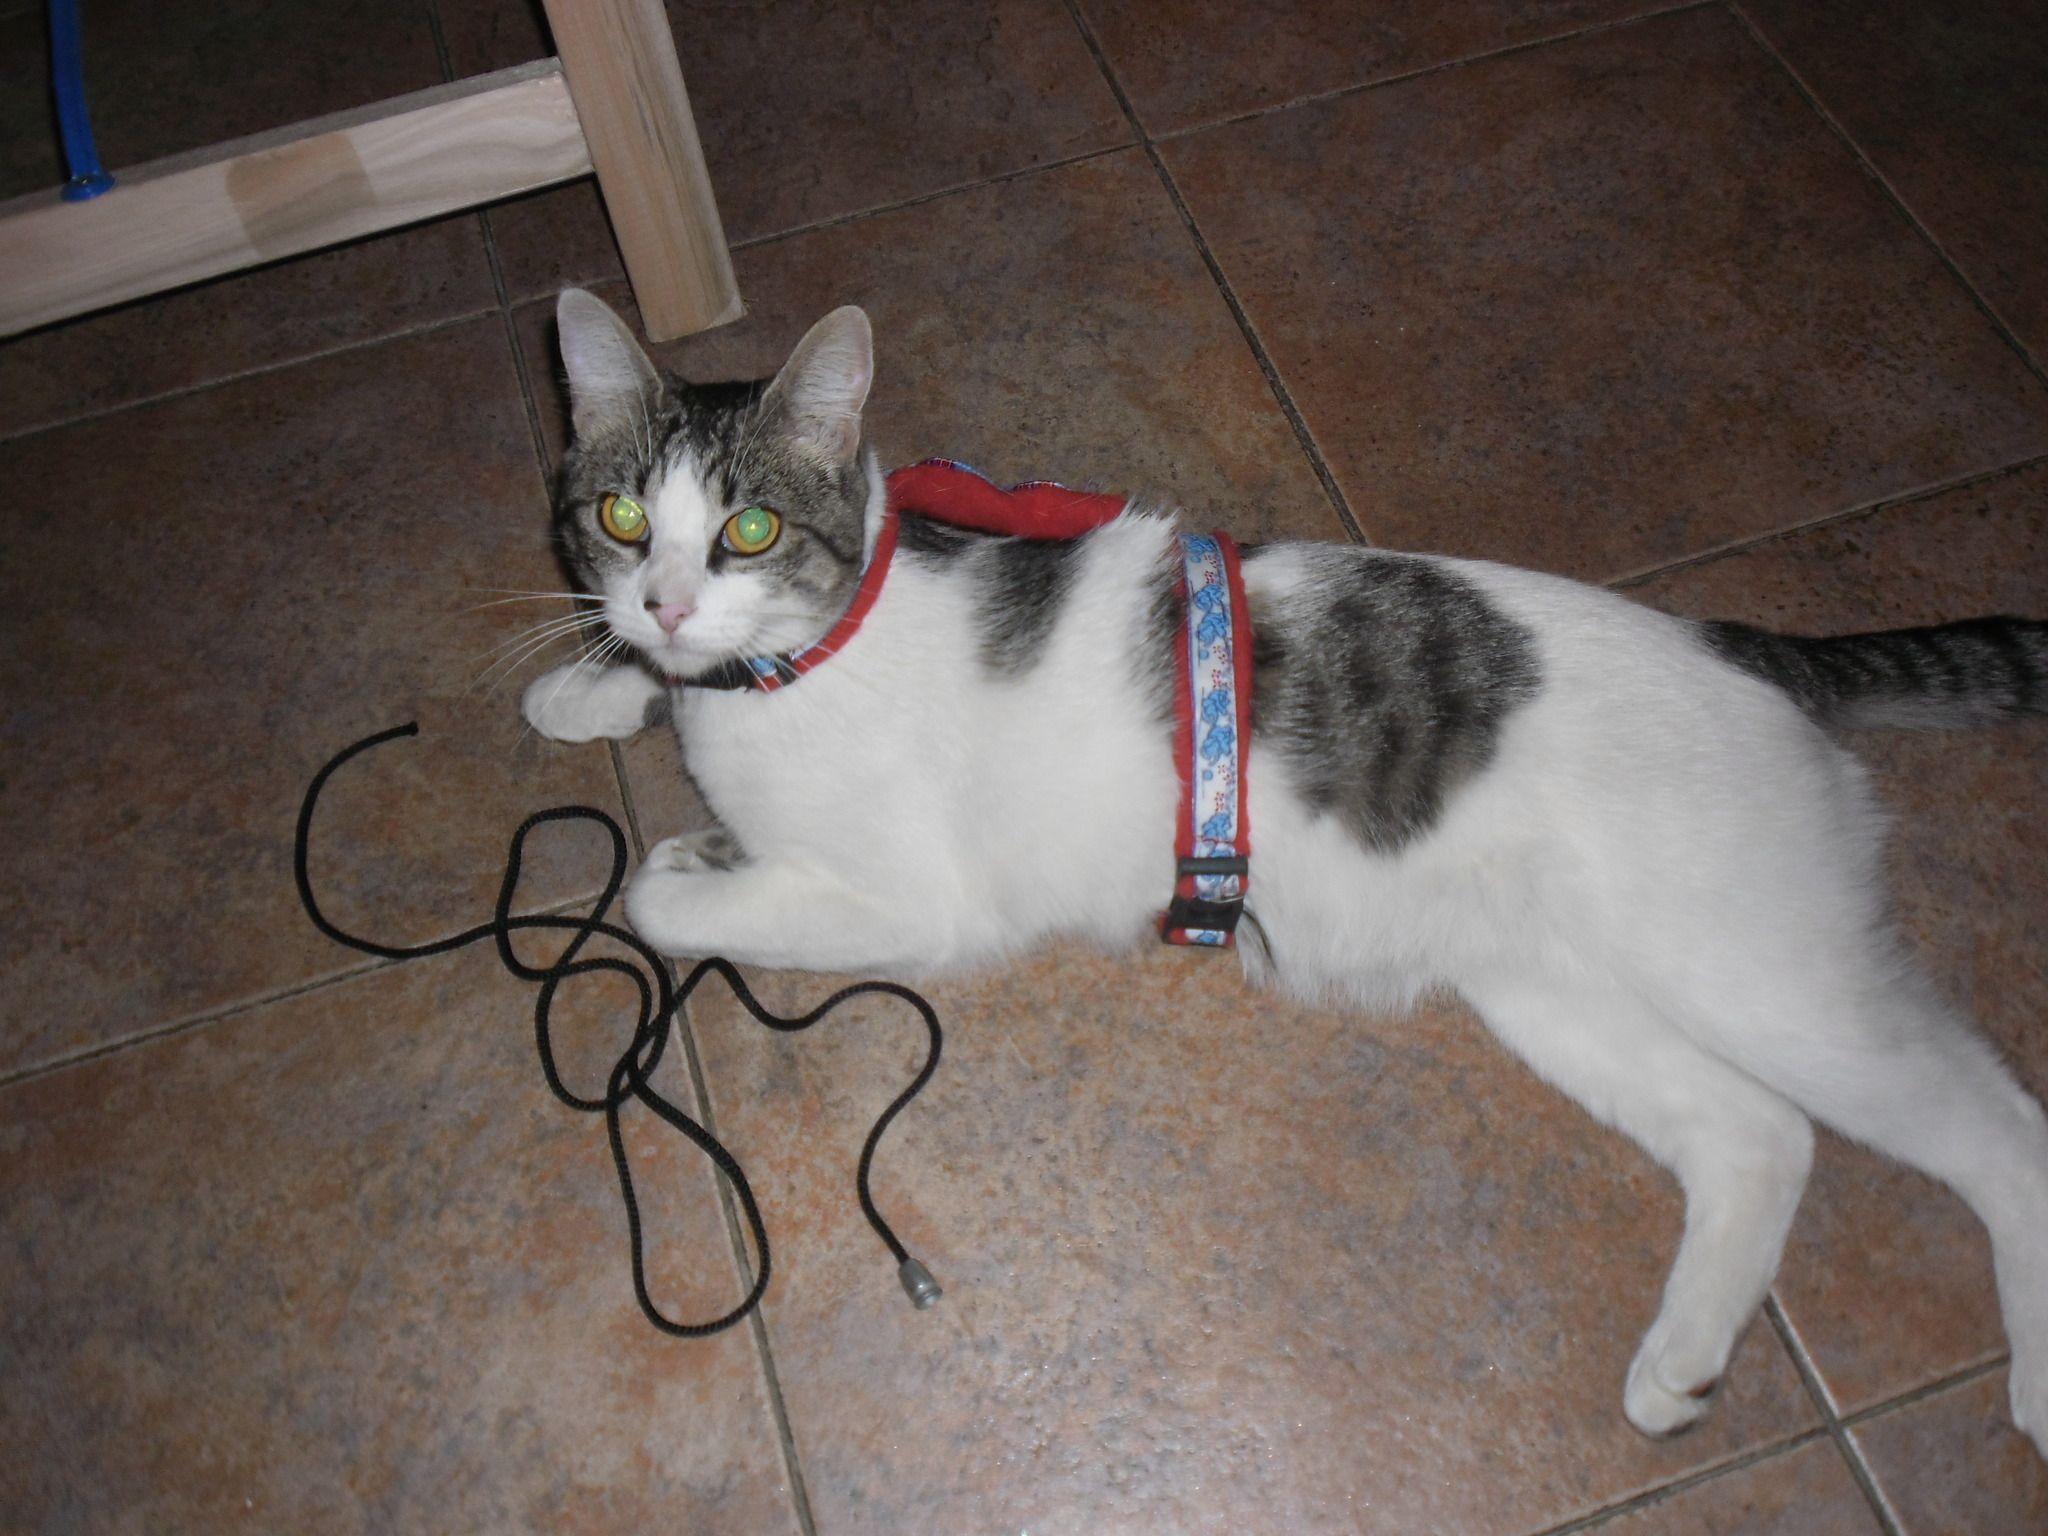 M s de ideas incre bles sobre Arnes para gatos en Pinterest